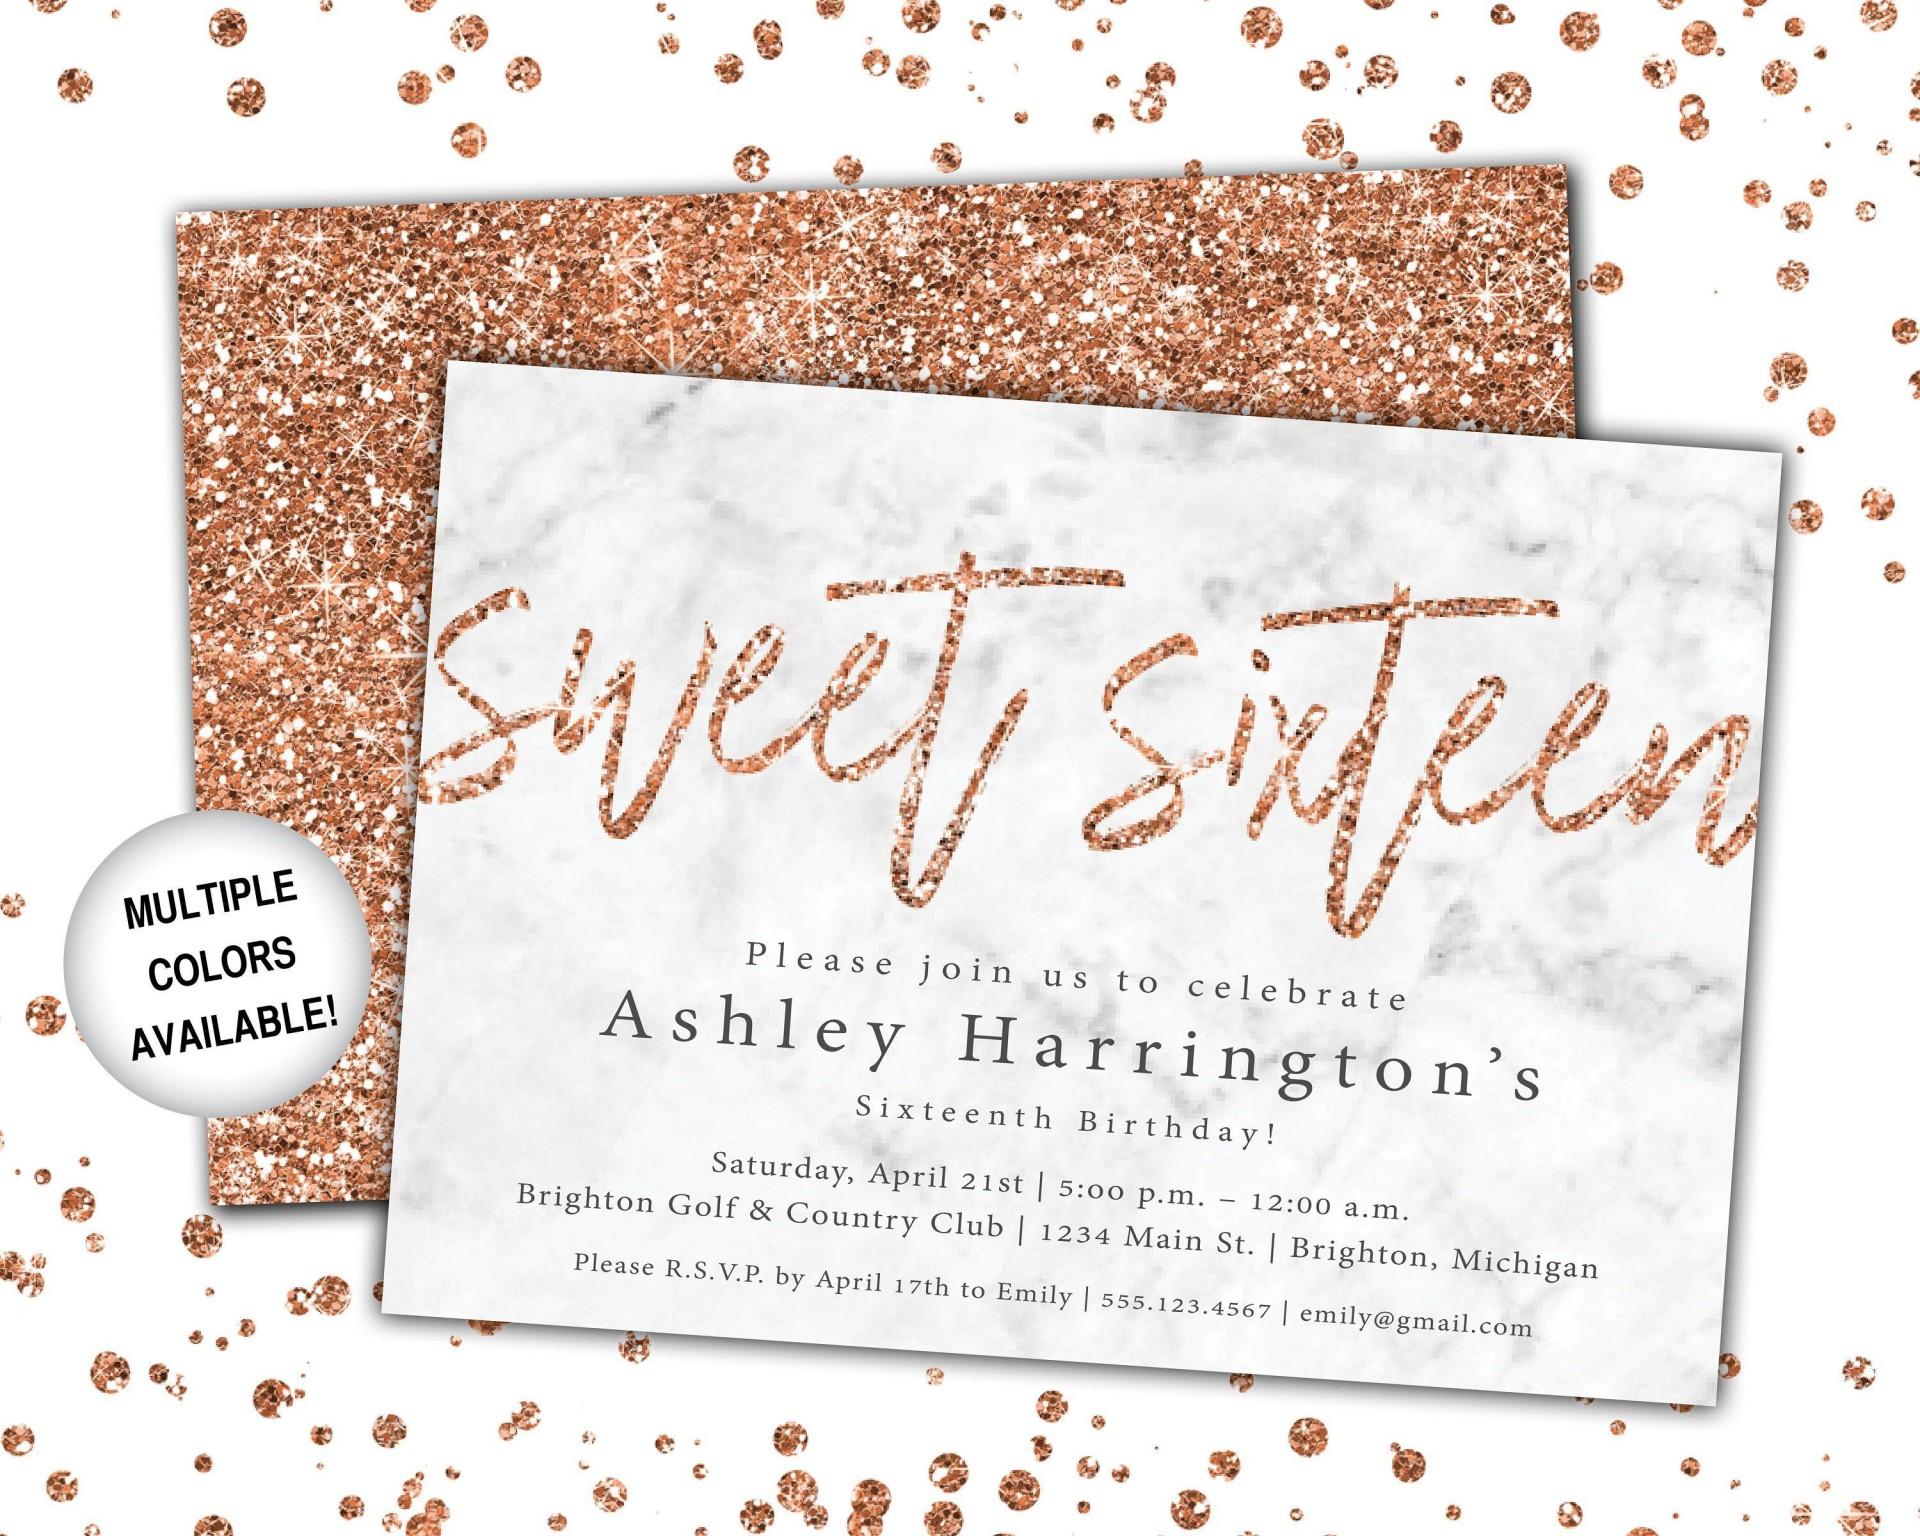 001 Impressive Sweet 16 Invite Template Photo  Templates Surprise Party Invitation Birthday Free 16th1920